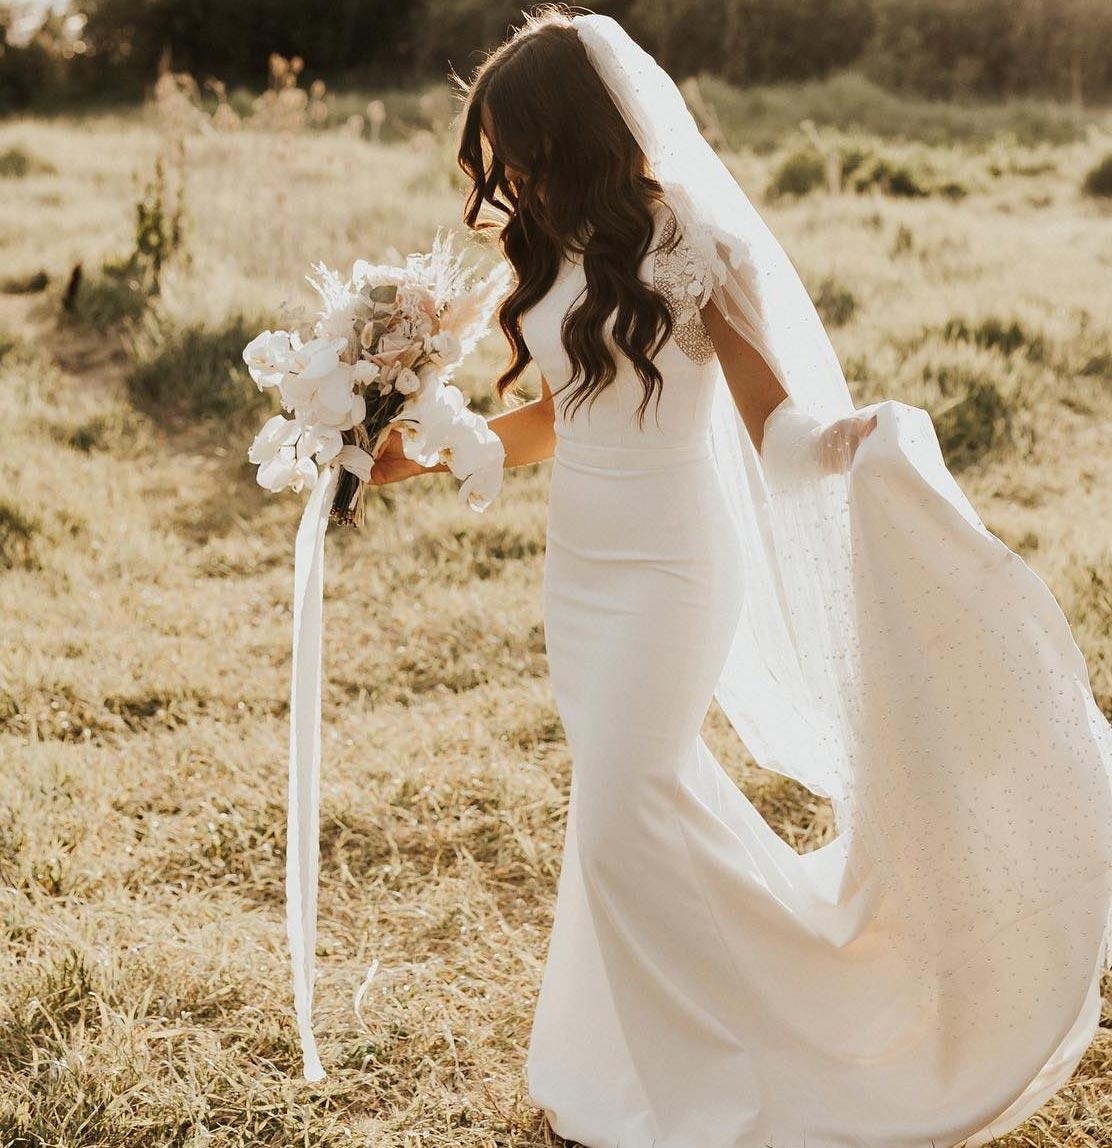 Pritchett Bridal   Orem, UT Bridal Boutique